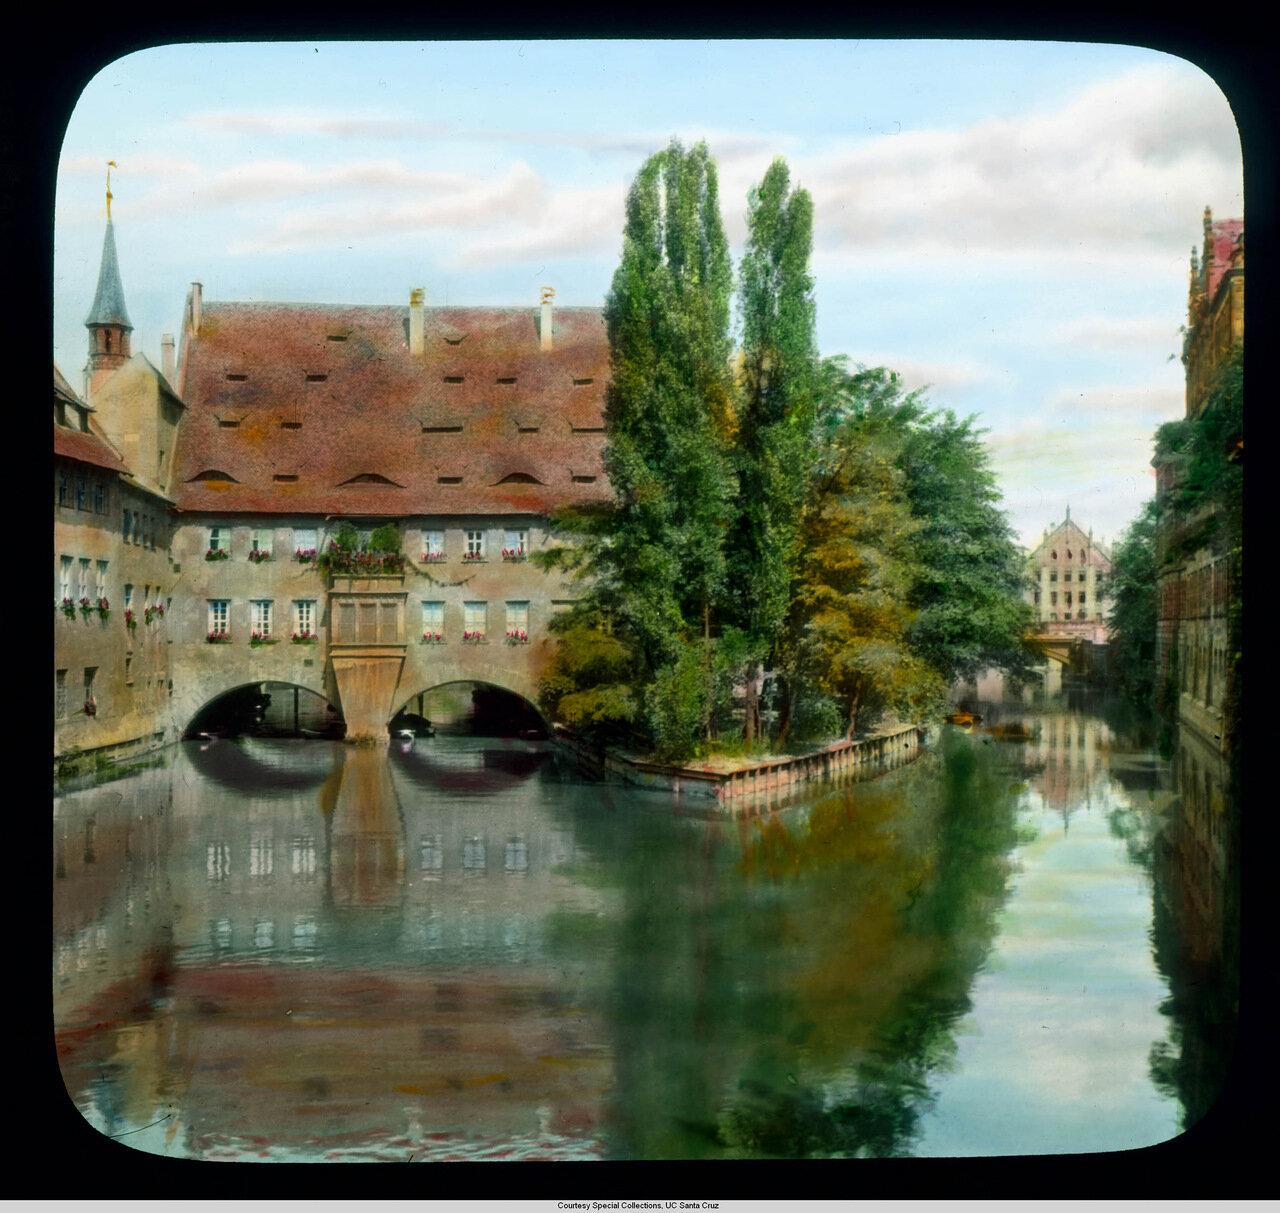 Нюрнберг. Госпиталь Св.Духа (1332-1339) над рекой Пегниц